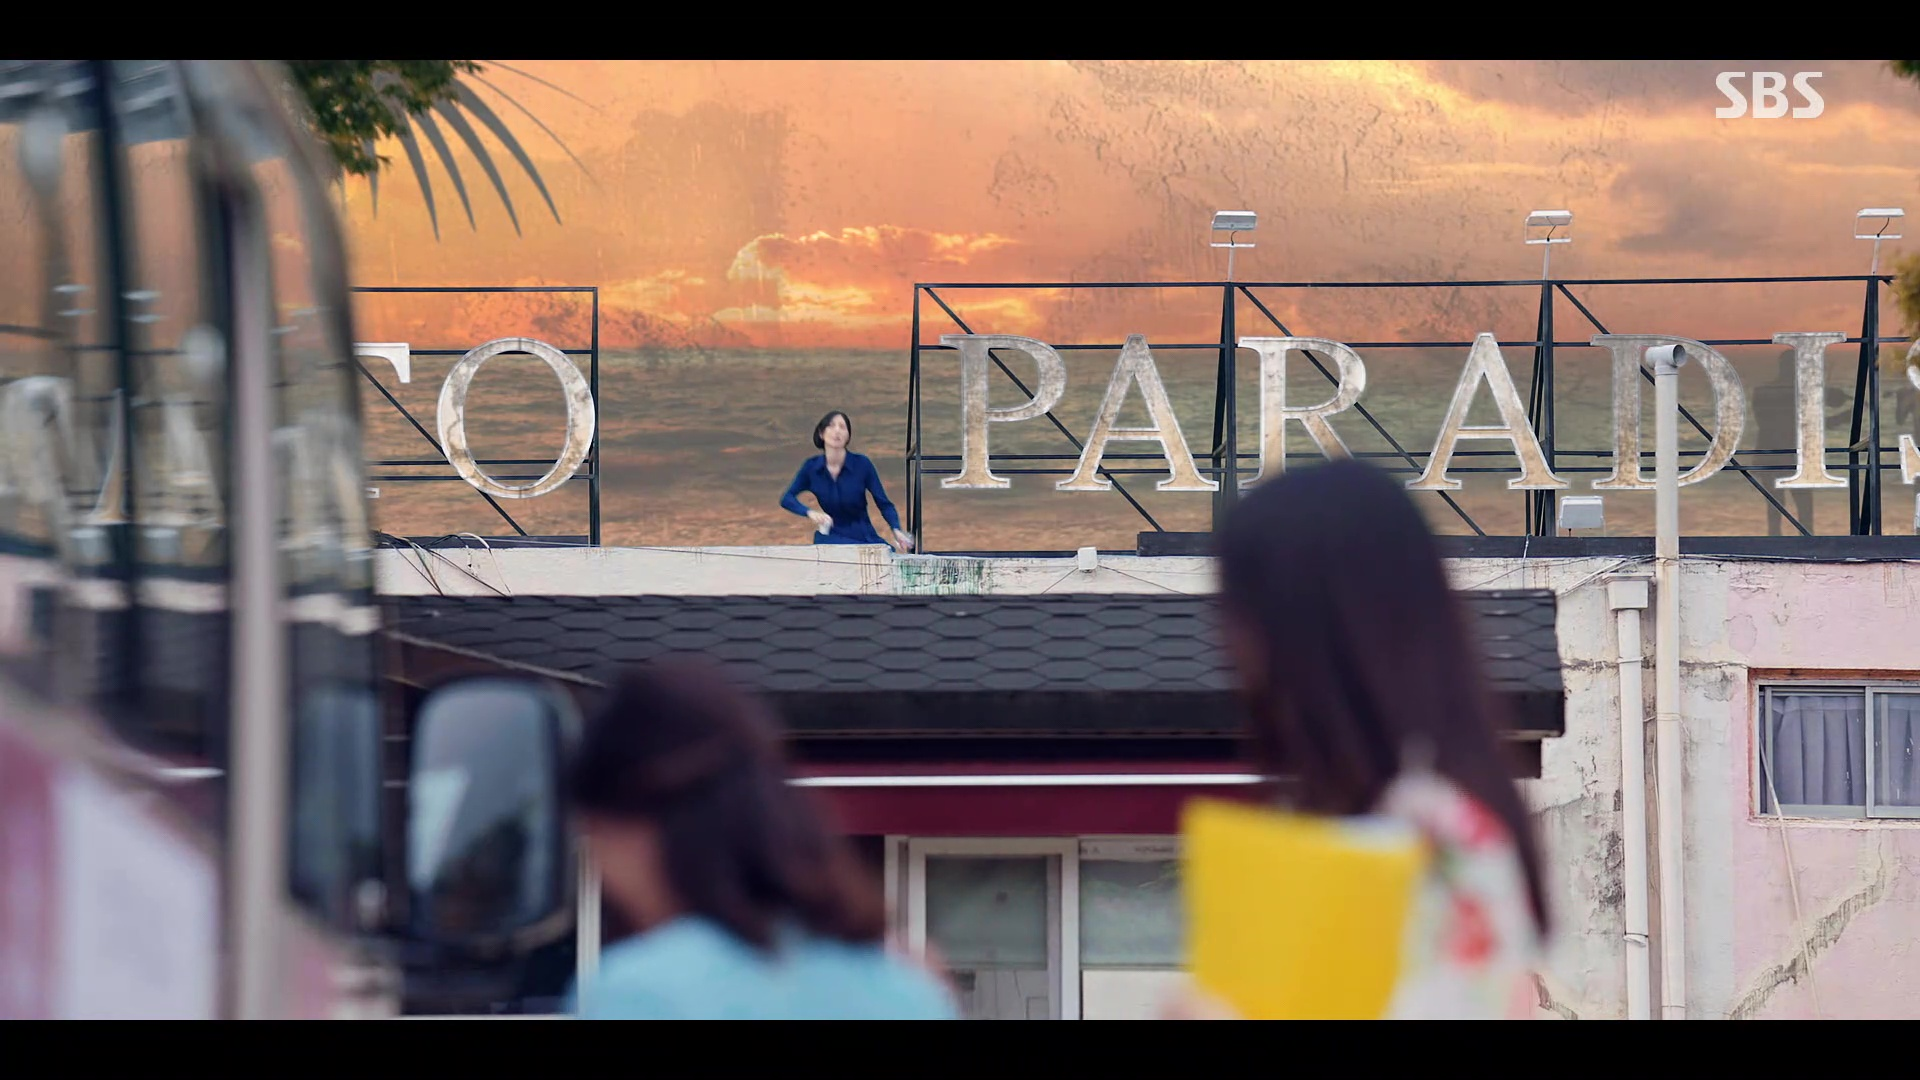 Penthouse Season 3 Episode 14 Finale Recap and Review